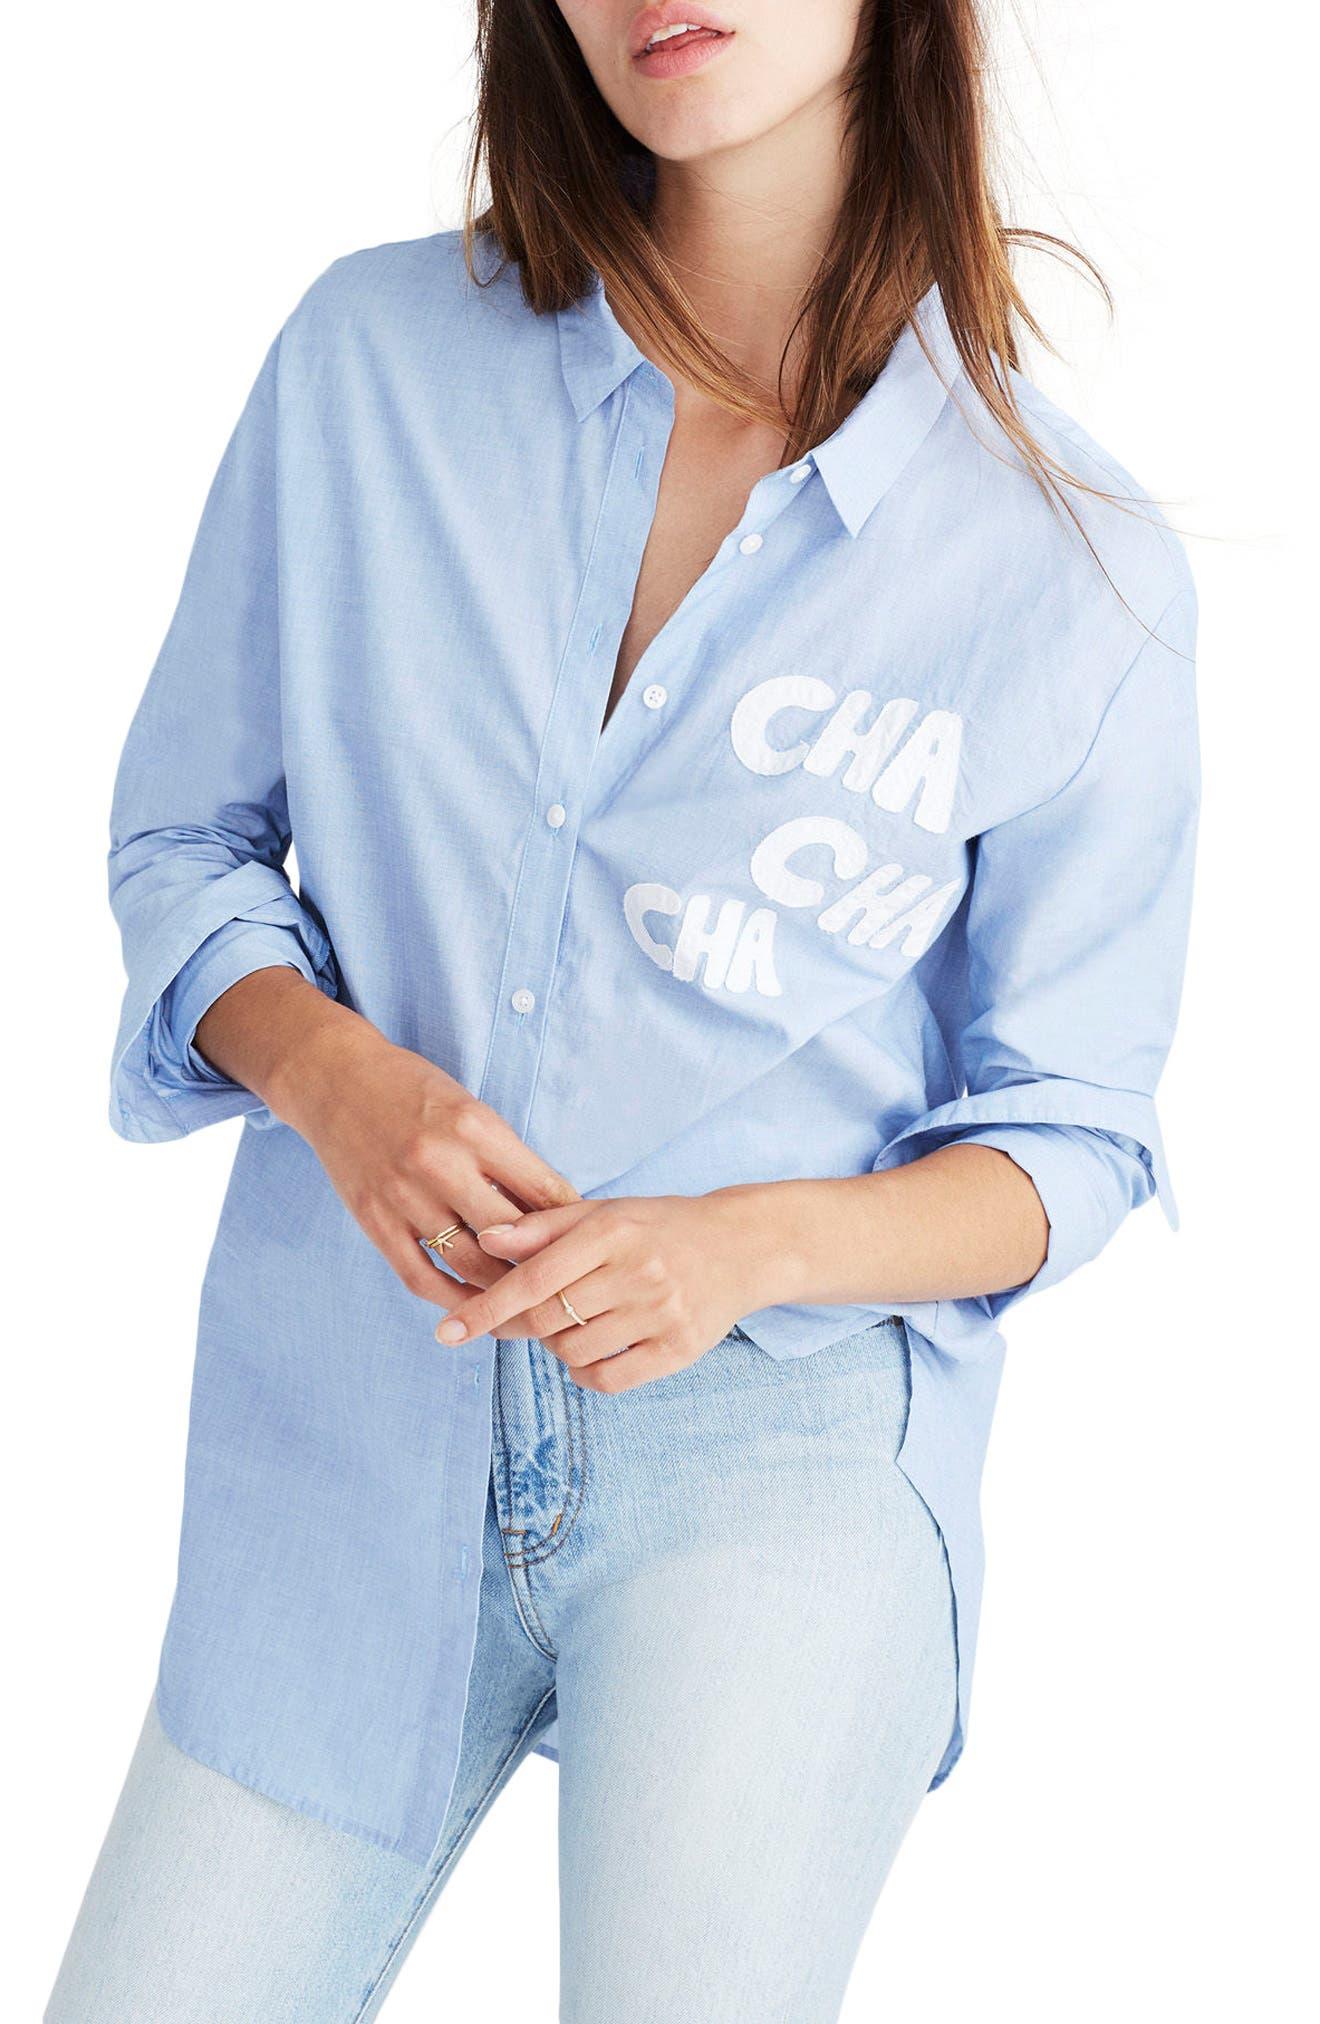 Cha Cha Cha Ex-Boyfriend Shirt,                             Main thumbnail 1, color,                             400